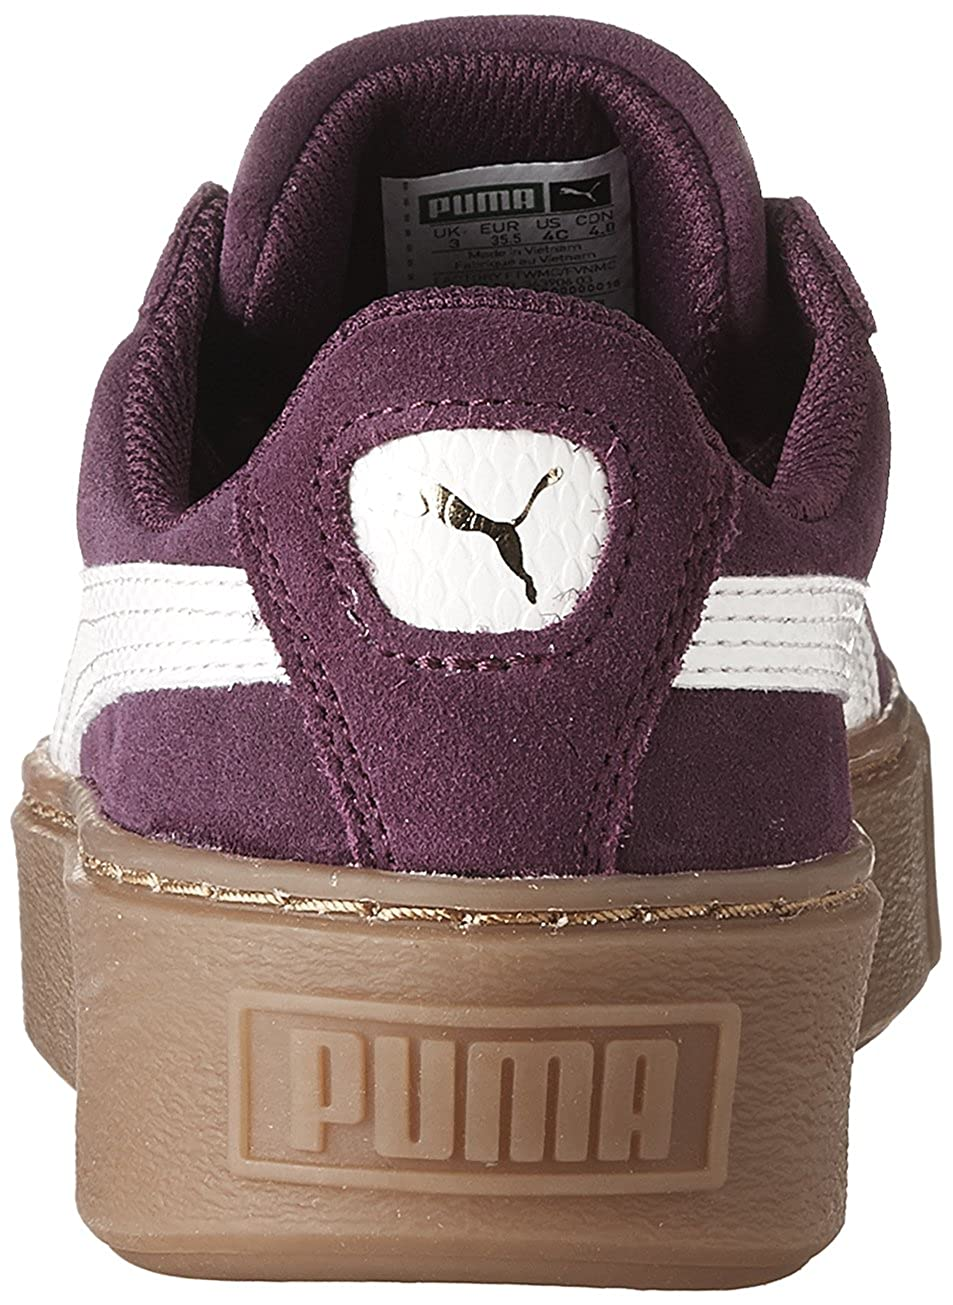 d127ad57d17859 PUMA Suede Platform SNK Kids Sneaker